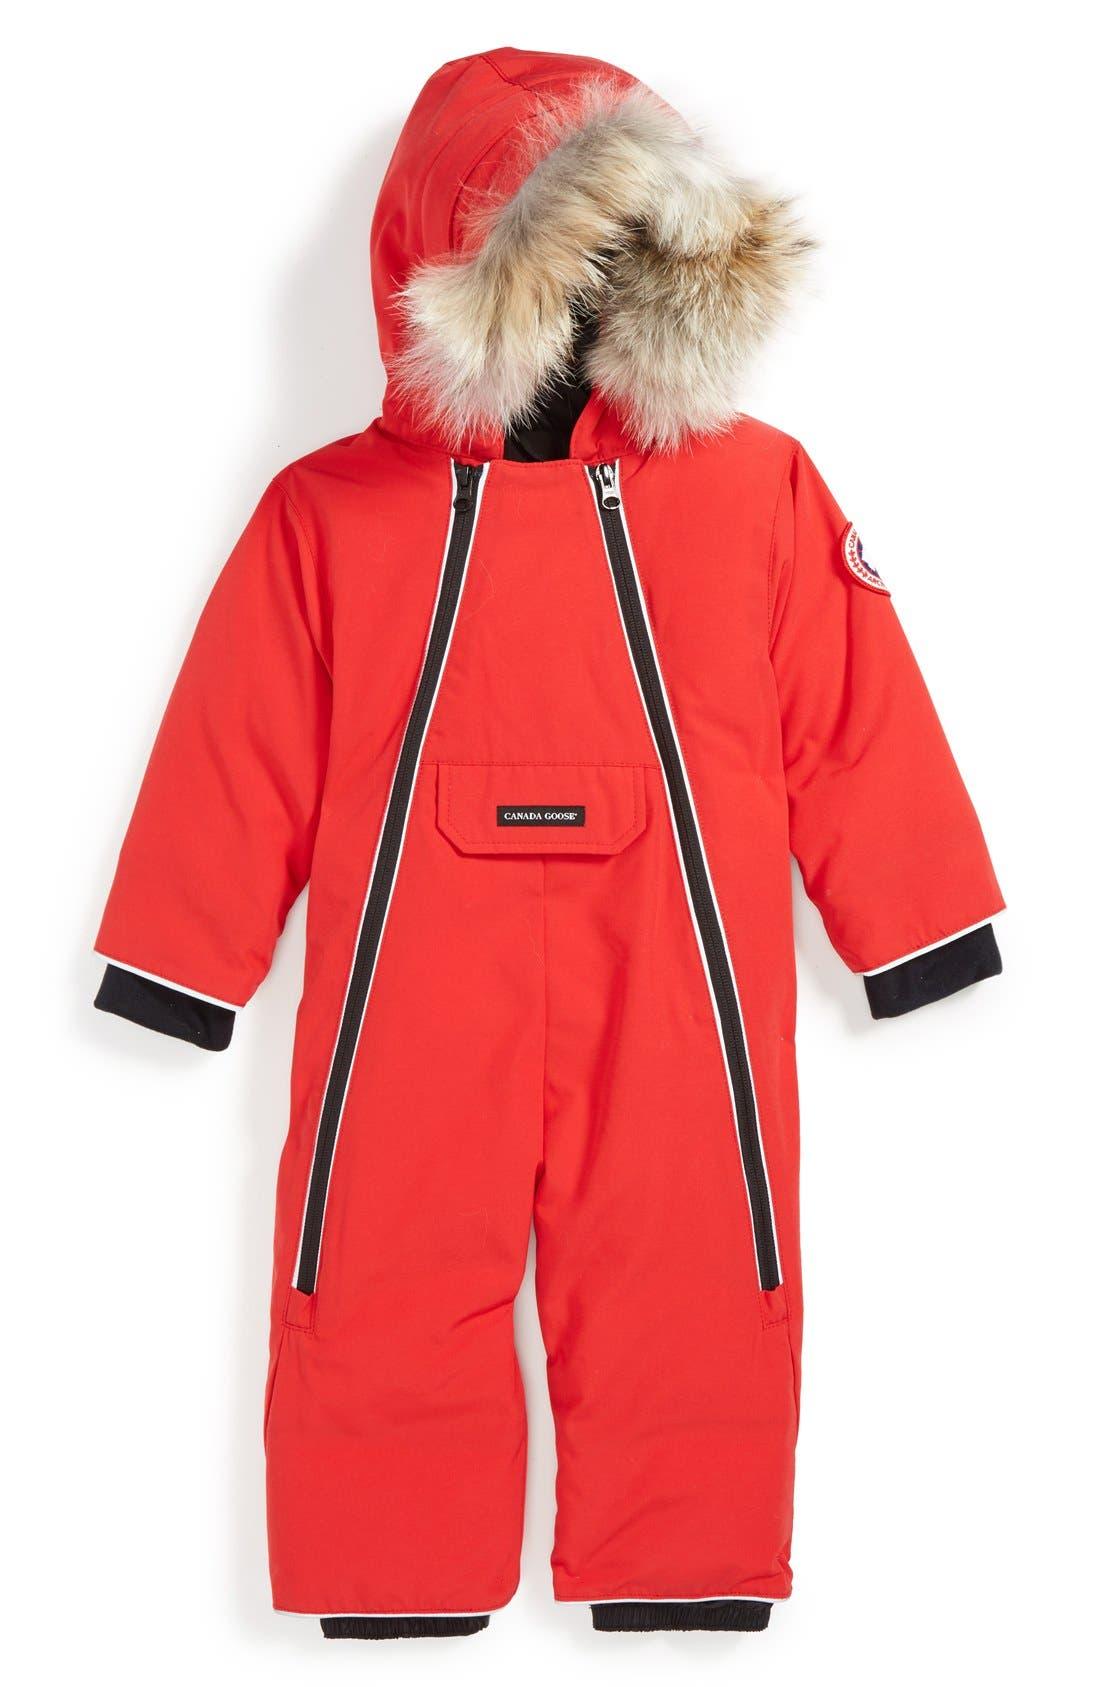 'Lamb' Down Snowsuit with Genuine Coyote Fur Trim,                         Main,                         color, Red